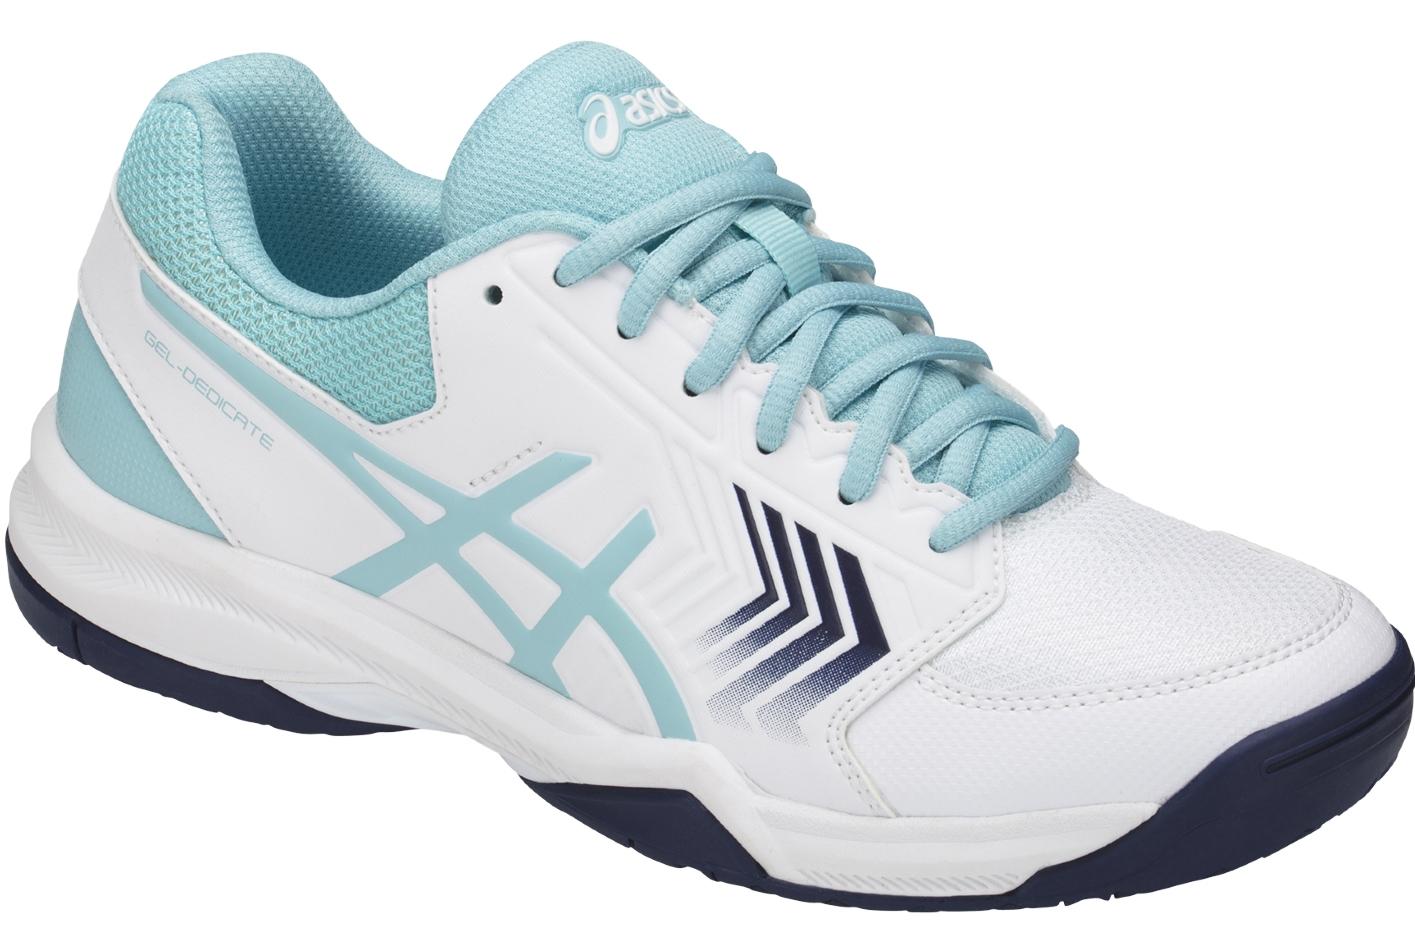 Dedicate 0114 Femme De Rose Chaussures Gel E757y 5 Asics Tennis oCBdex